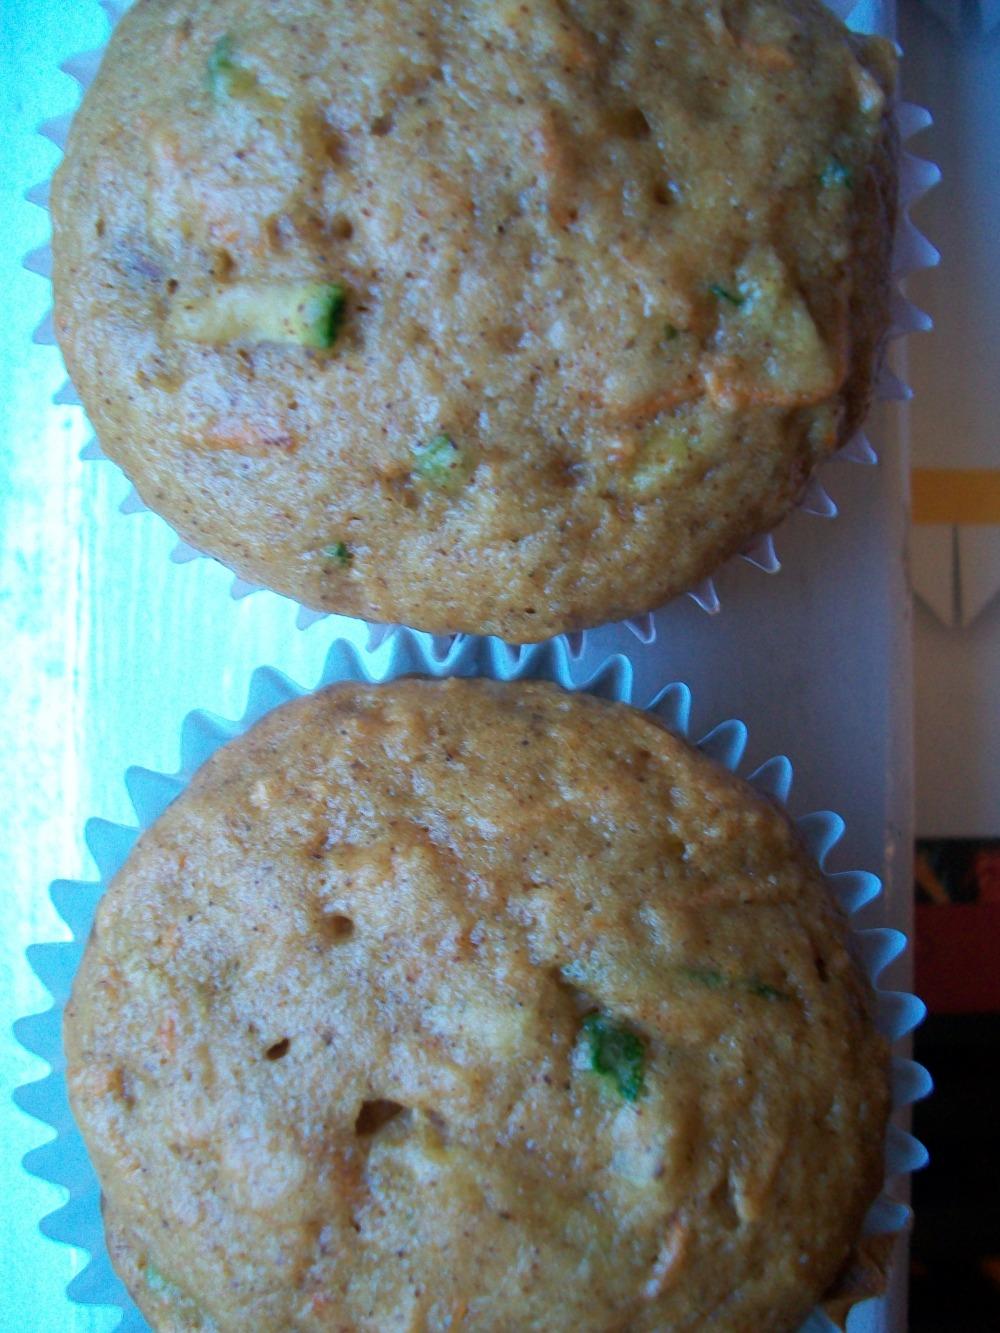 Farmer's Market Muffins